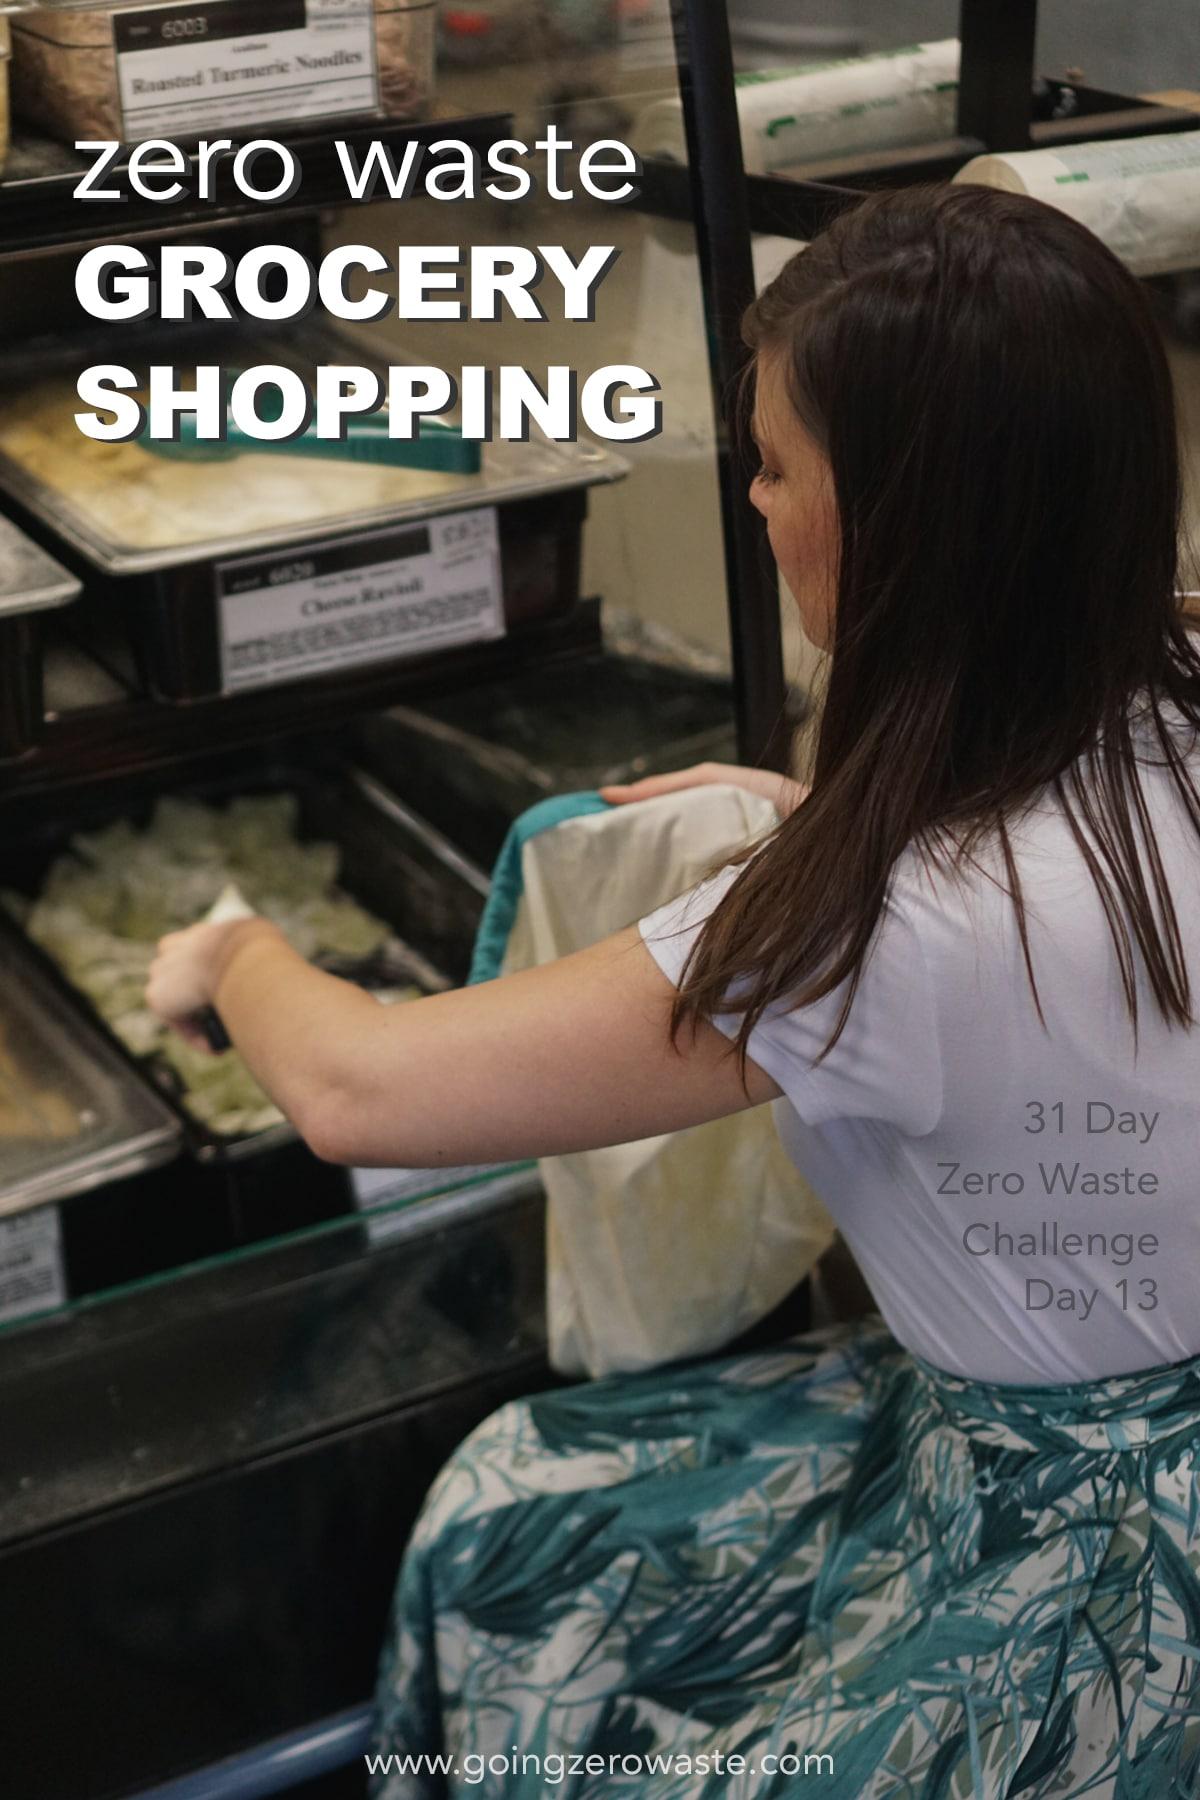 Zero Waste Grocery Shopping - Day 13 of the Zero Waste Challenge